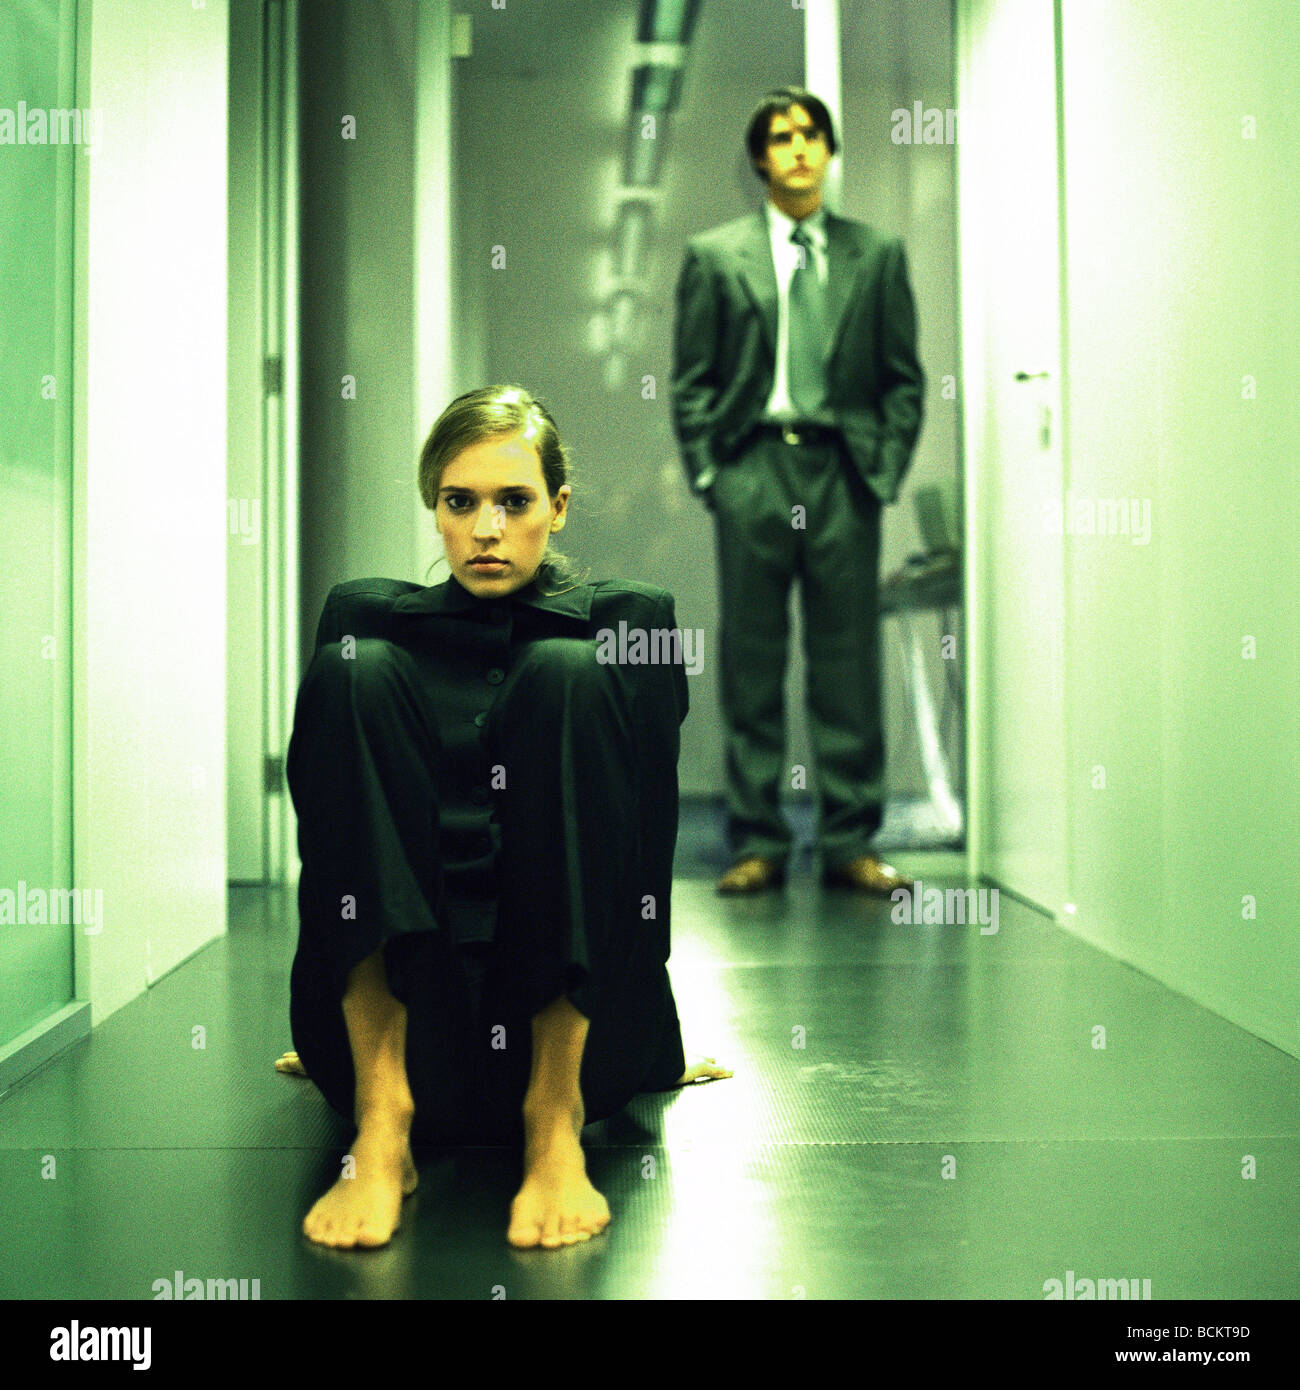 Woman sitting on floor in hallway, man standing behind - Stock Image